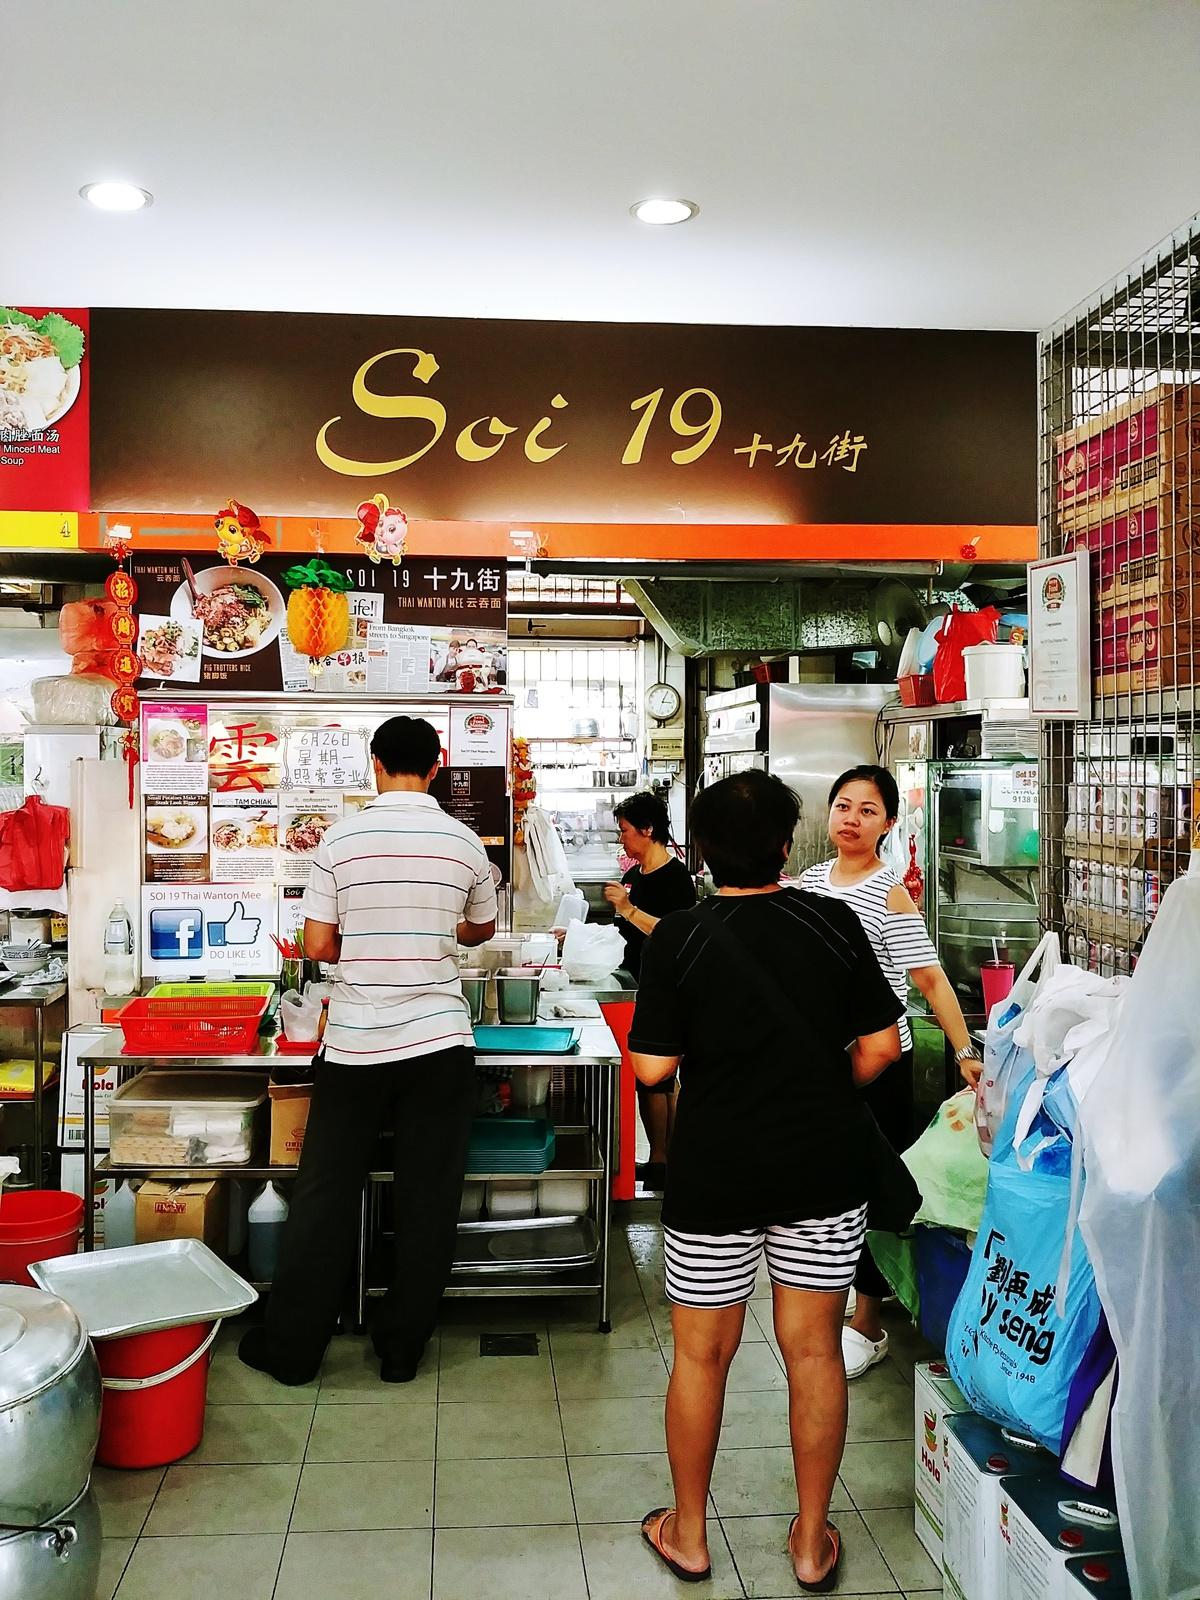 Soi 19 Thai Wanton Mee Ang Mo Kio